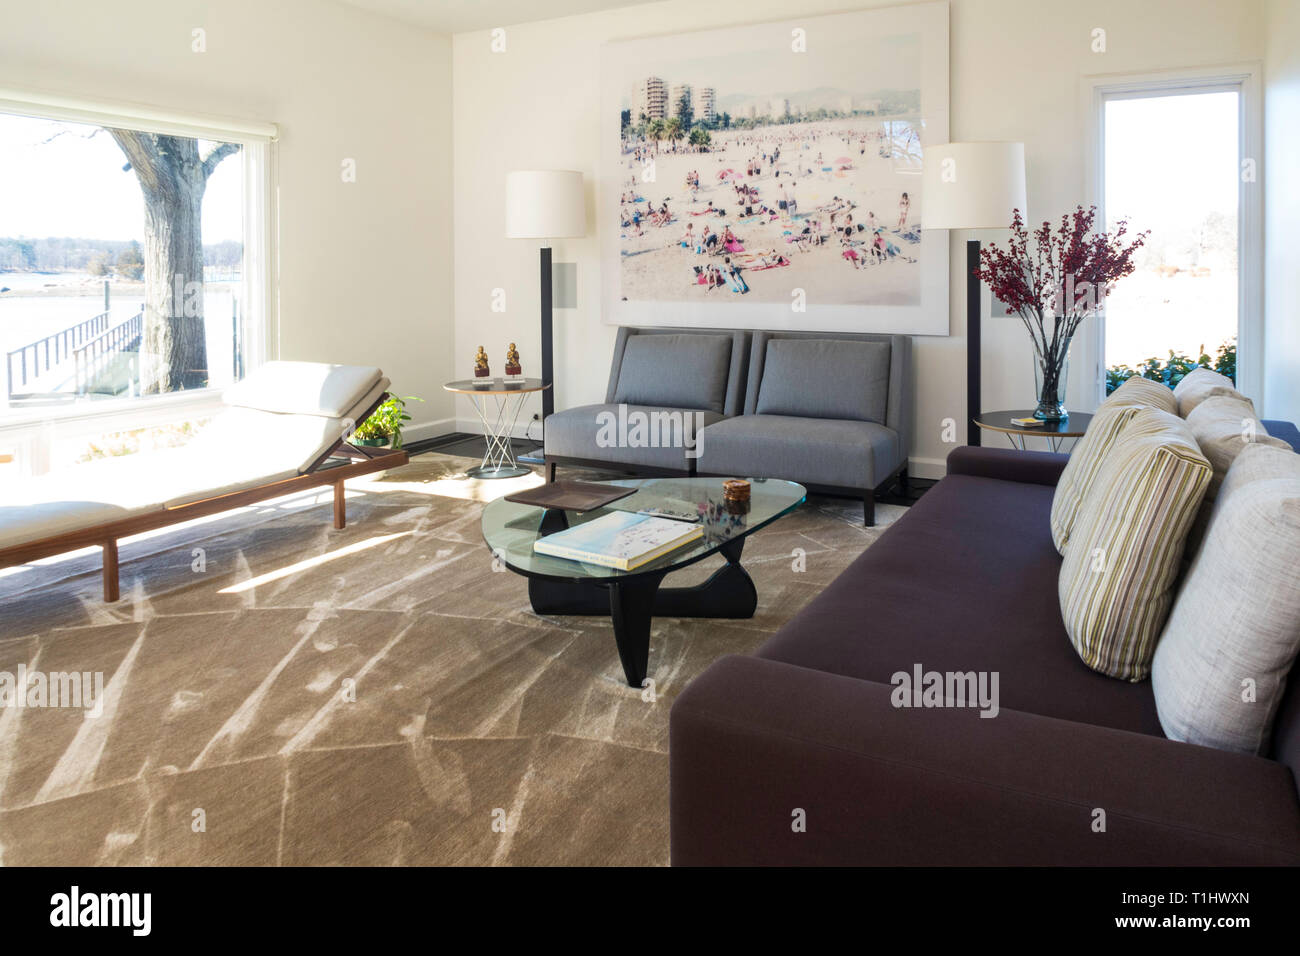 Showcase Home Interior, USA Stock Photo